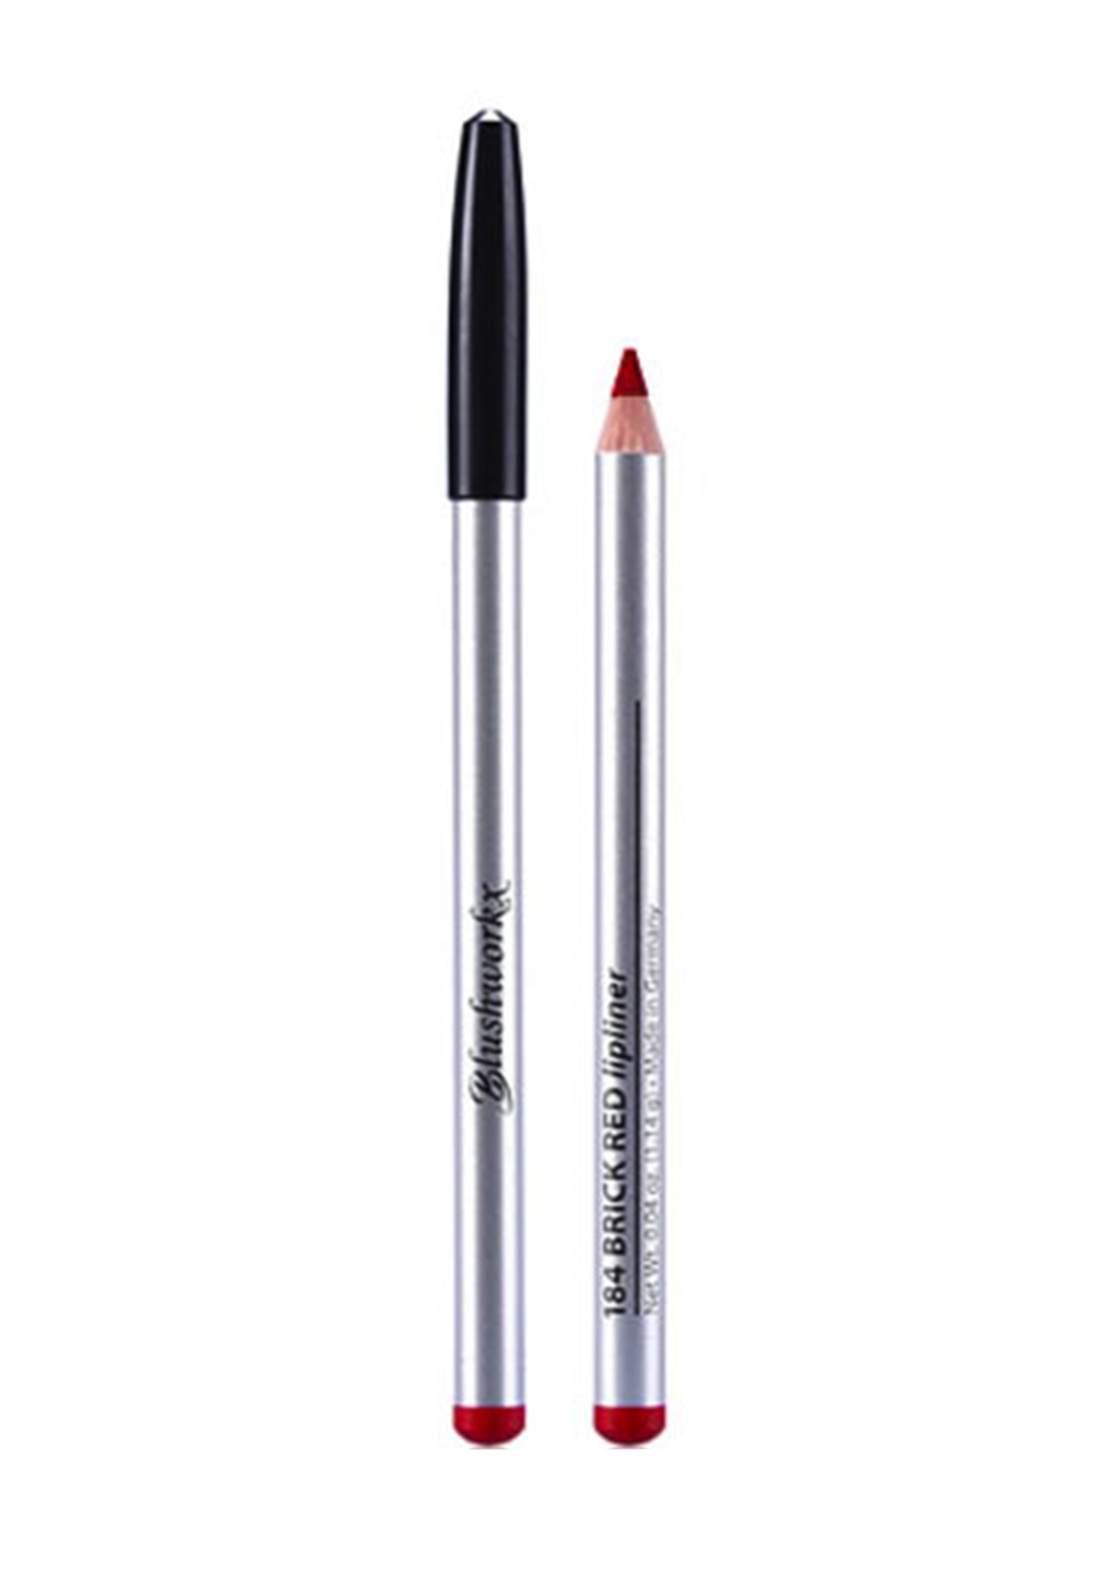 Blushworkx Hollywood Lip Liner Pencil No.186 Red Velvet 1.14g محدد الشفاه